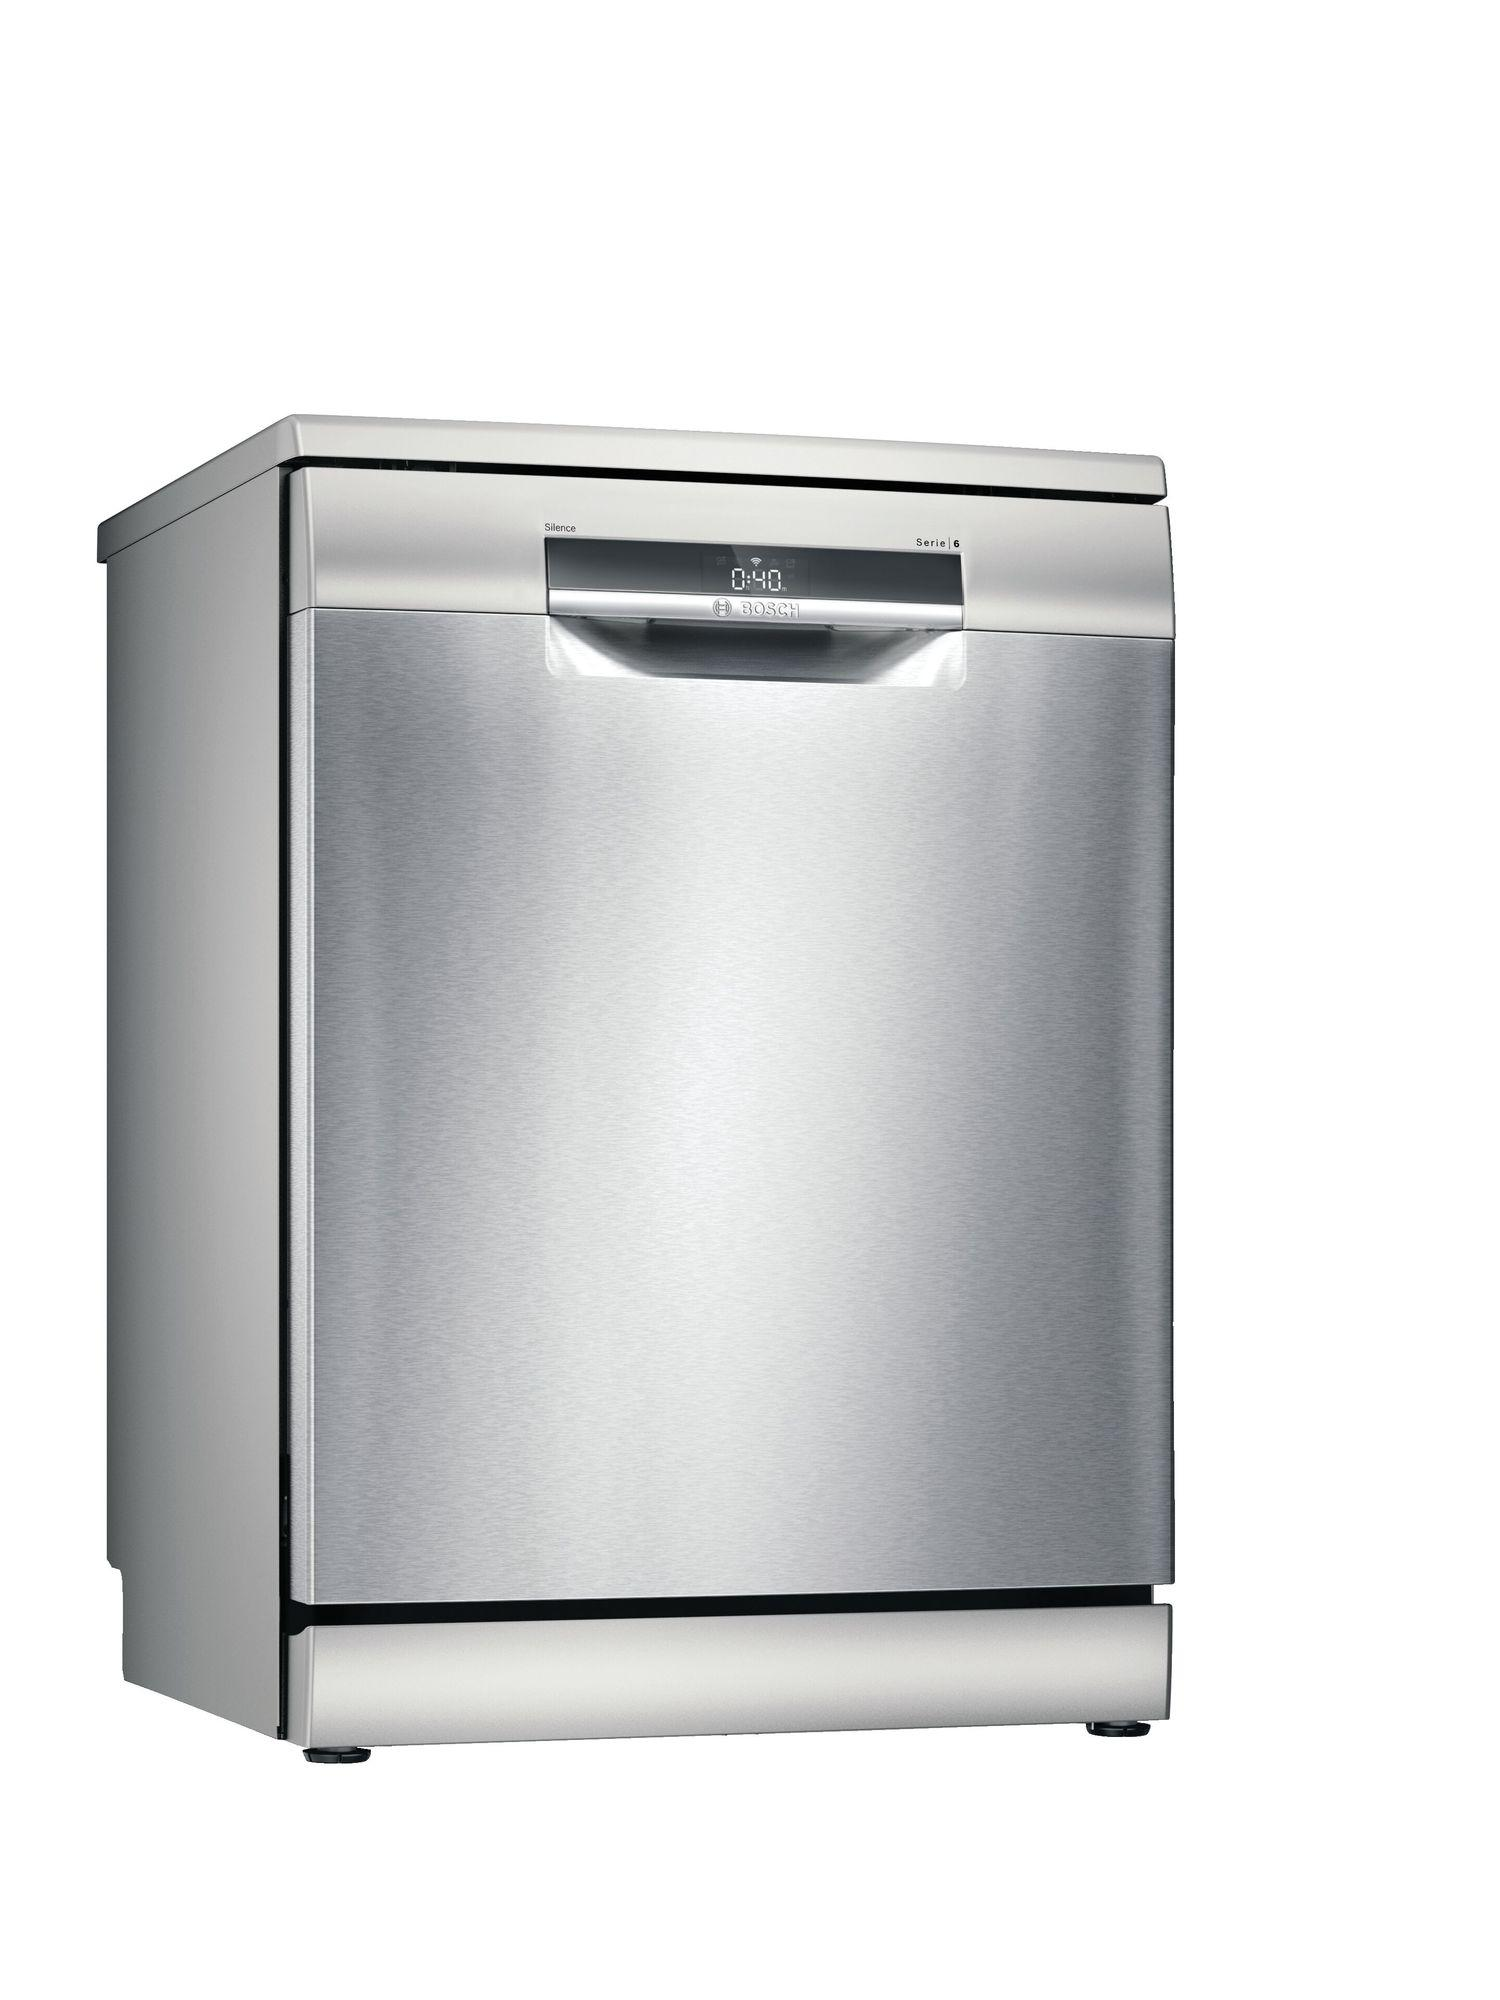 Image of Serie 6 SMS6EDI02G 60cm Standard Dishwasher | Silver Innox